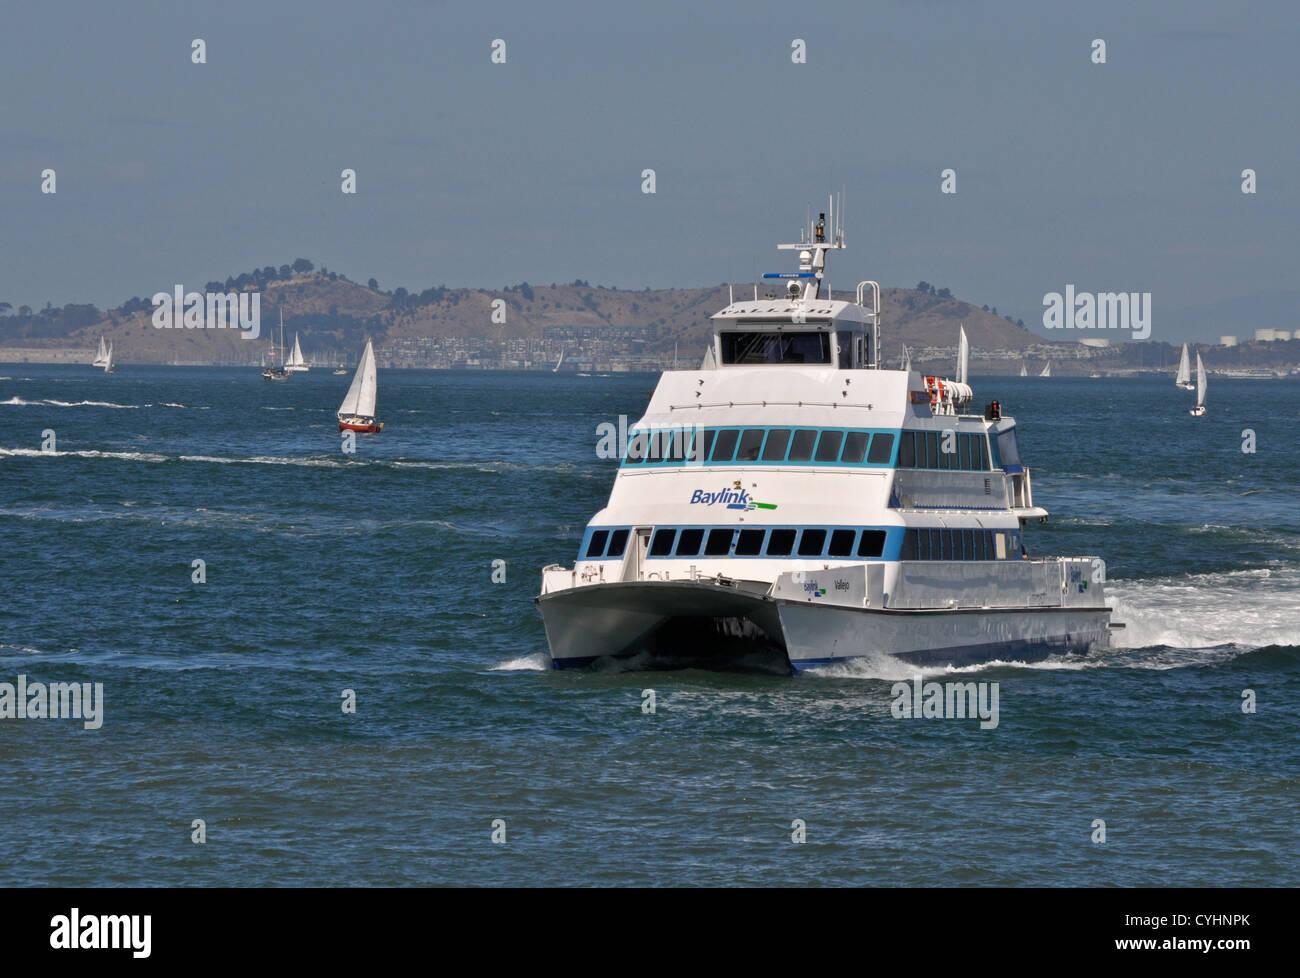 Vallejo Ferry Arrives In San Francisco Stock Photo Alamy